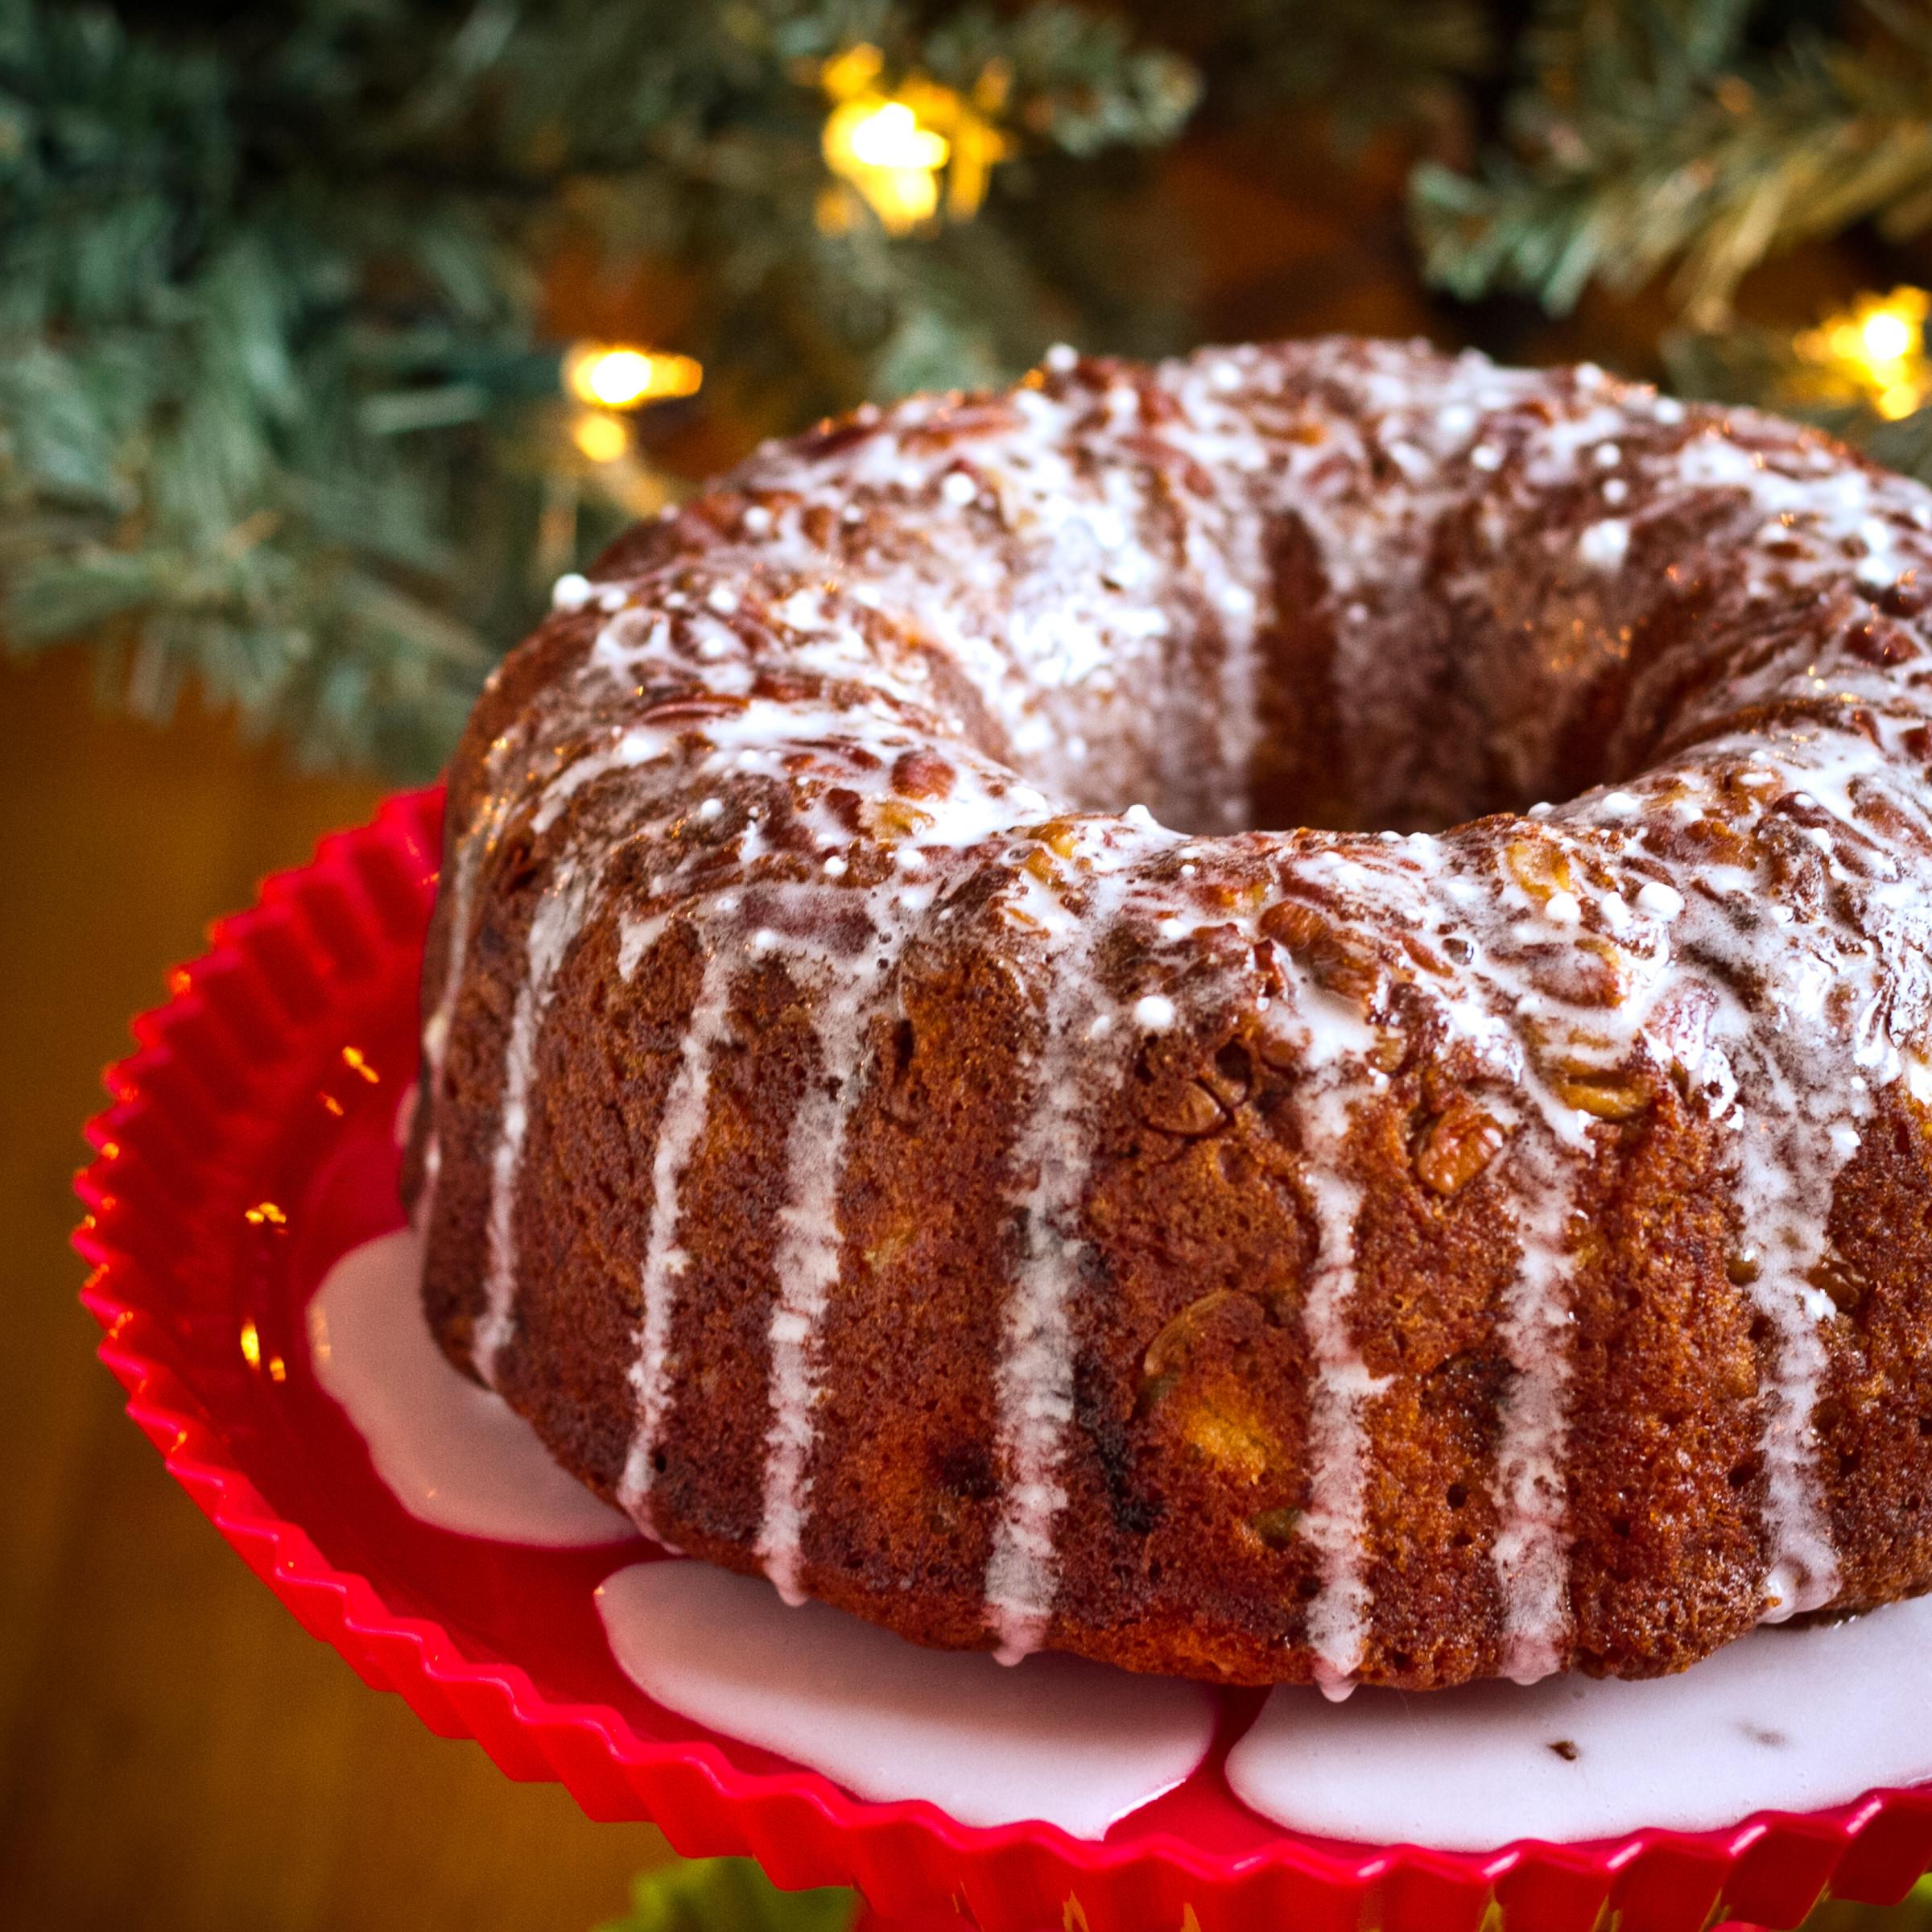 Rum Bundt Cake  Banana Pineapple Bundt Cake with Coconut Rum Glaze Poet